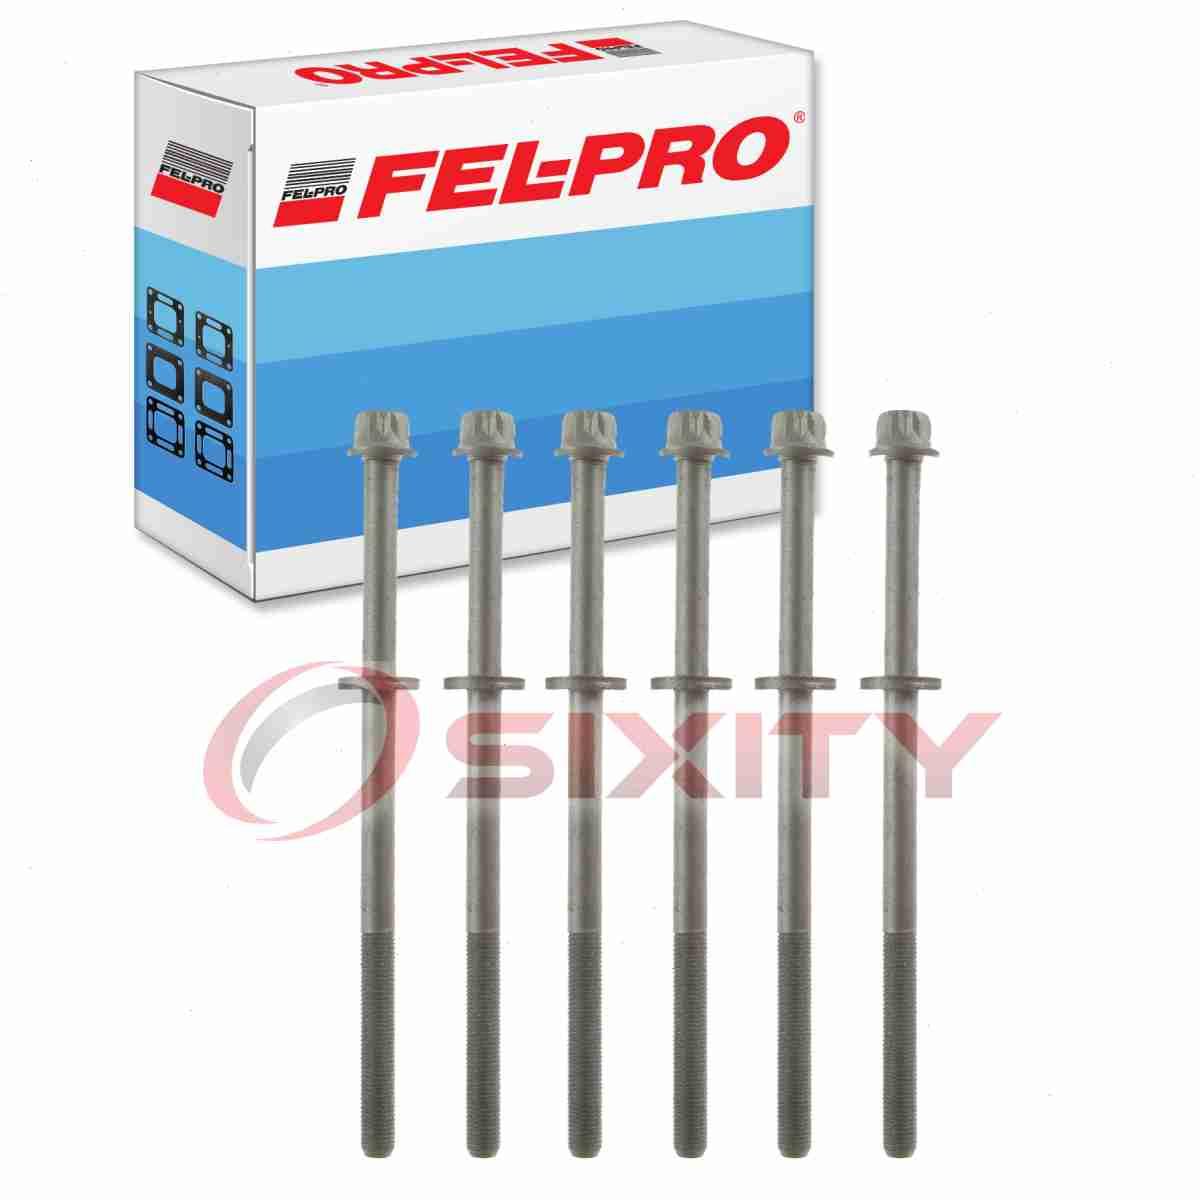 Engine Piston Block fd Fel-Pro ES 72212 Cylinder Head Bolt Set FelPro ES72212